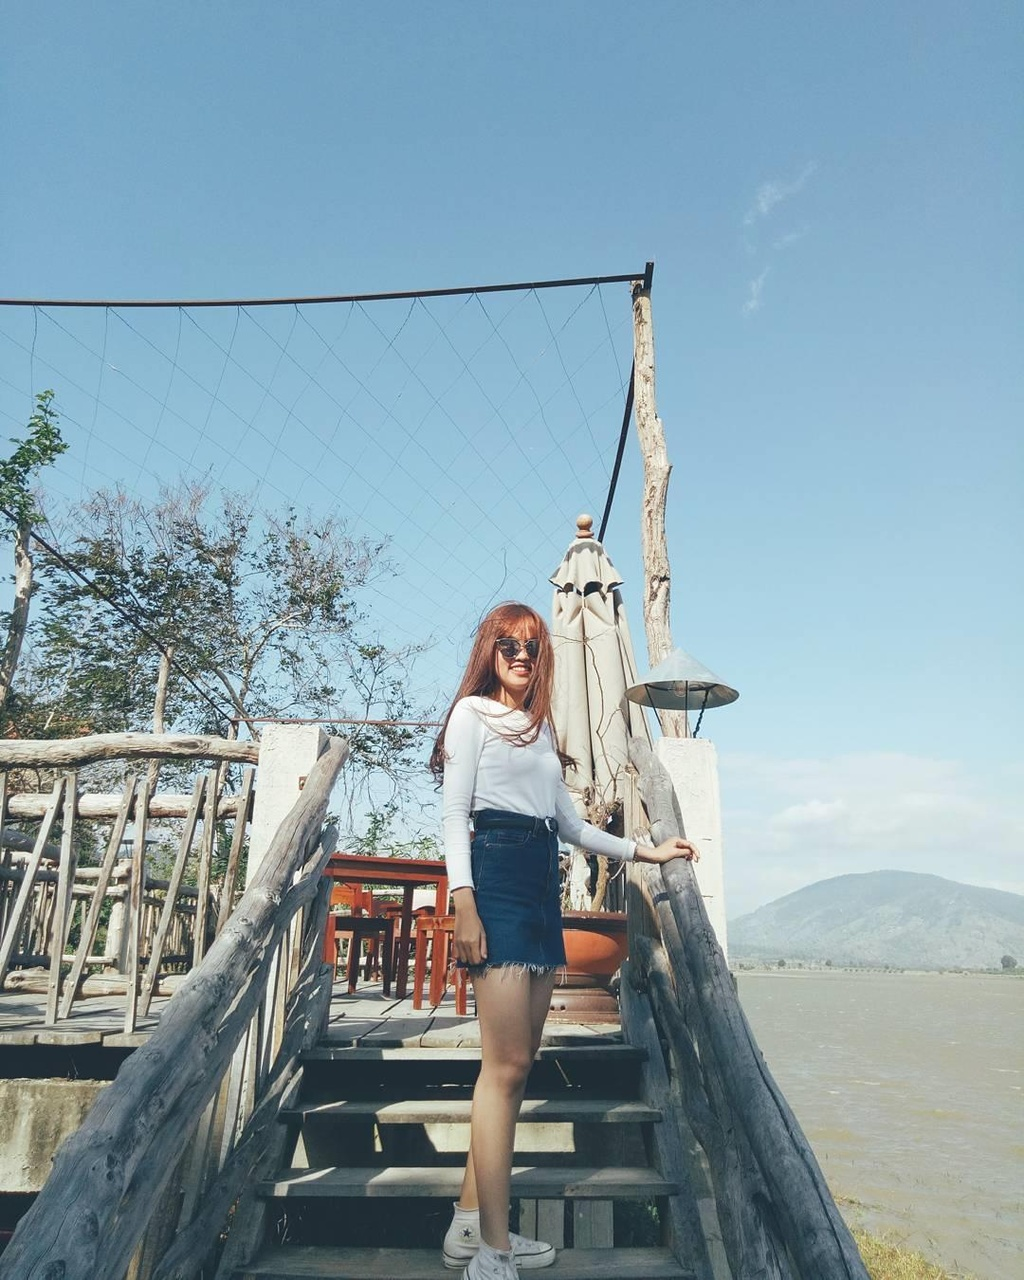 Cam trai kieu 'chanh sa' tai resort giua long rung nui Tay Nguyen hinh anh 10